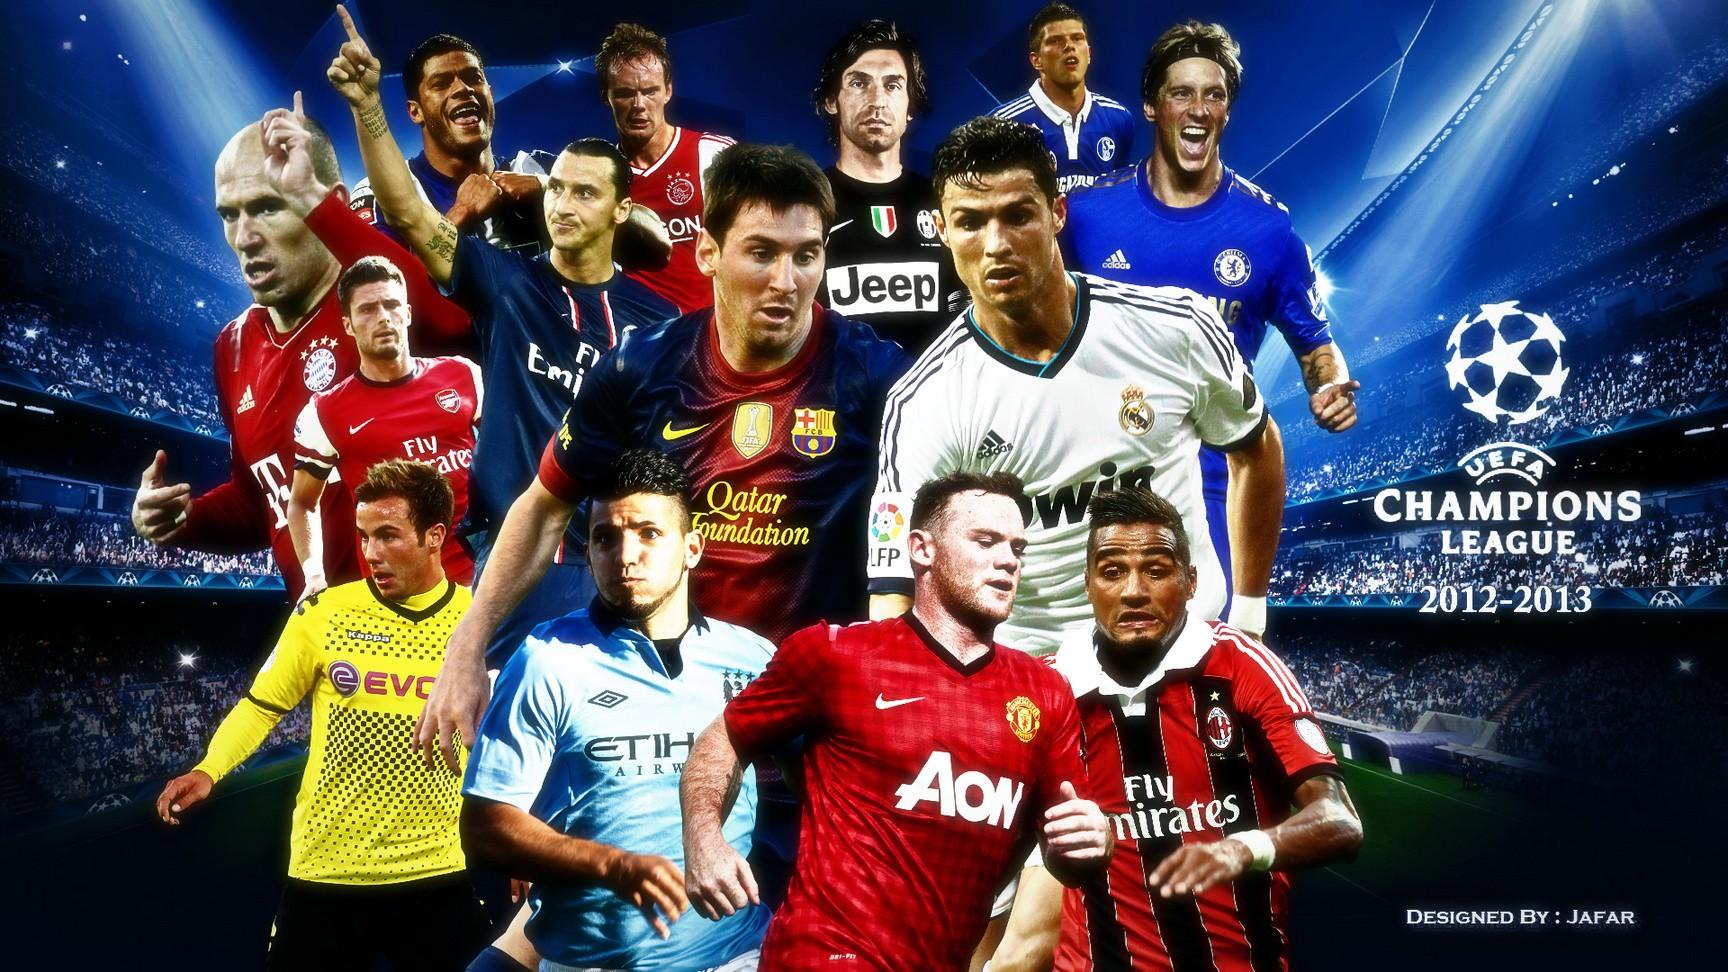 Cool soccer backgrounds wallpaper 1728x972 voltagebd Images